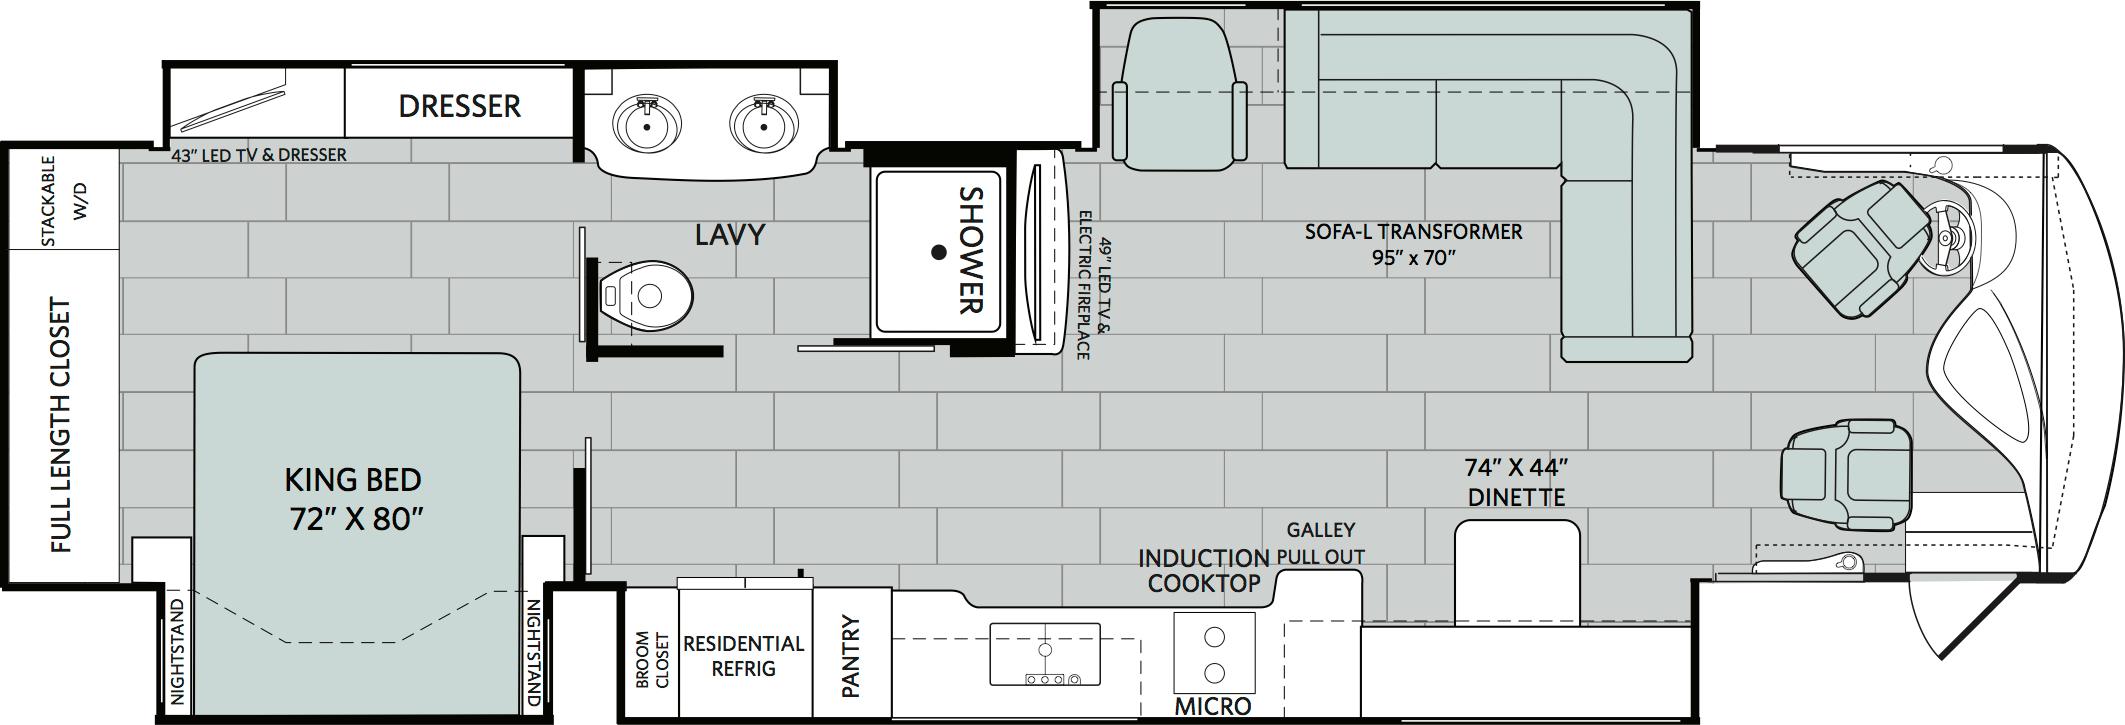 Floorplan 39F